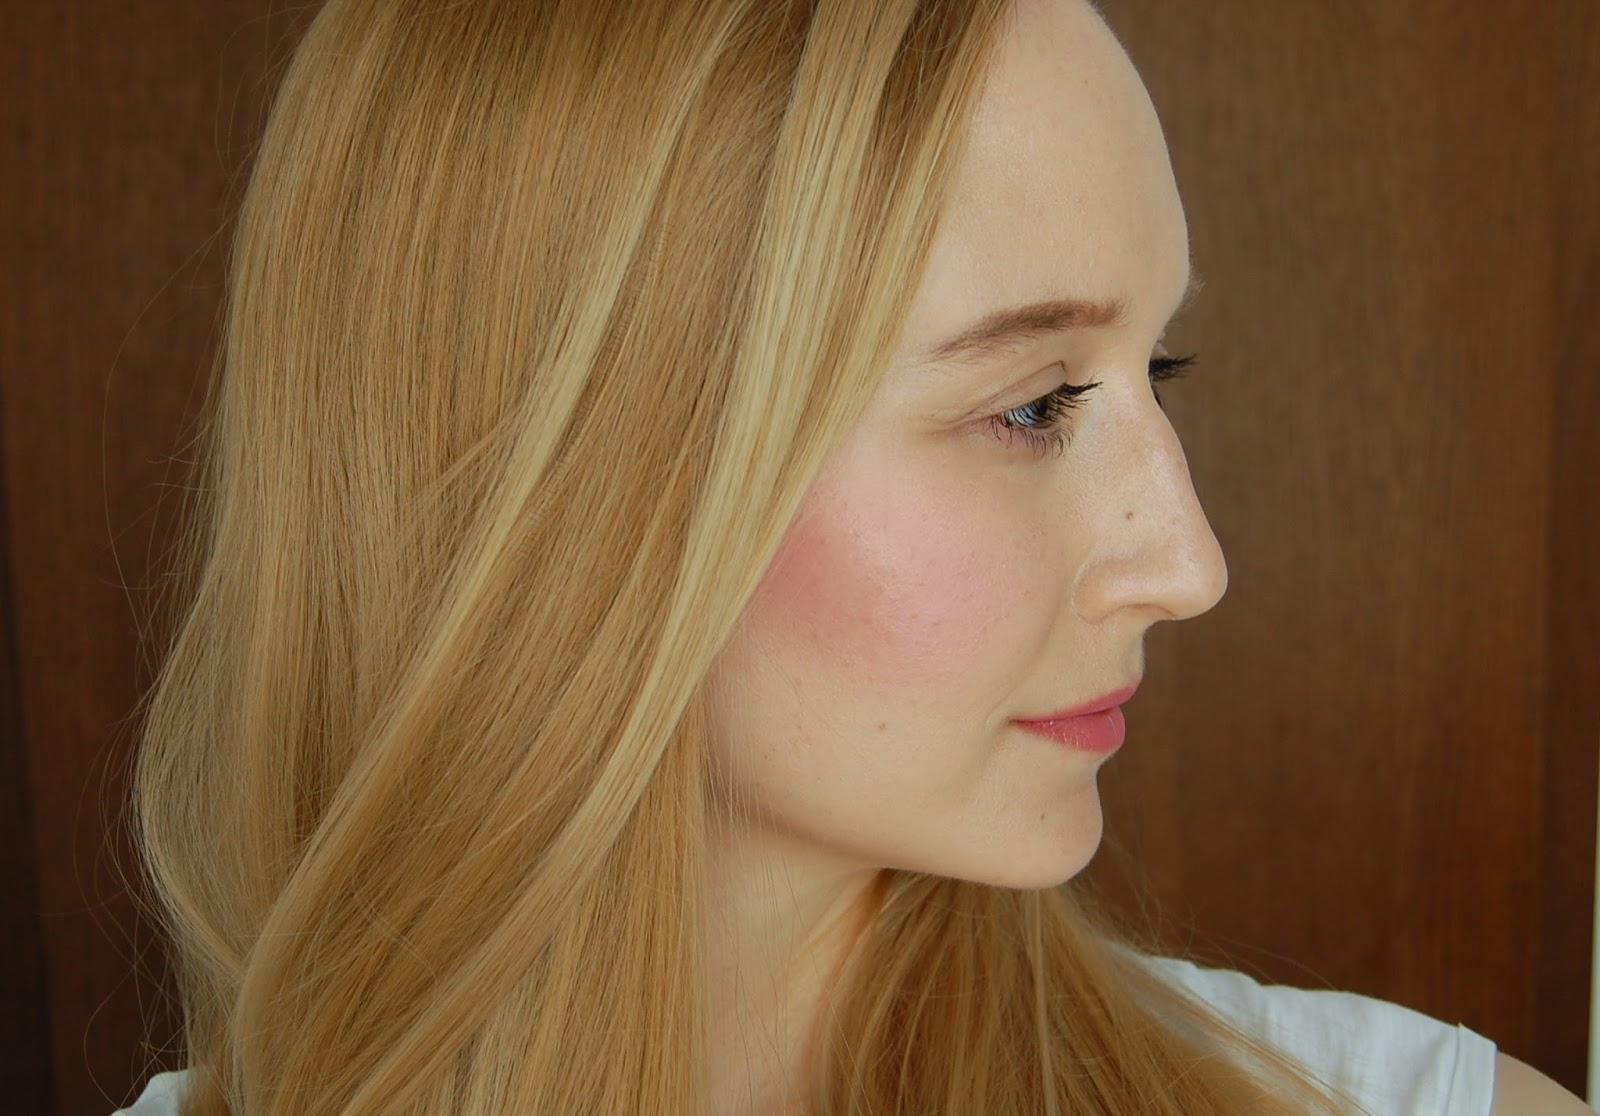 Delizioso Skincare Tara Collection Adorned Blushing Mousse, Lily Lolo Romantic Rose Lipstick